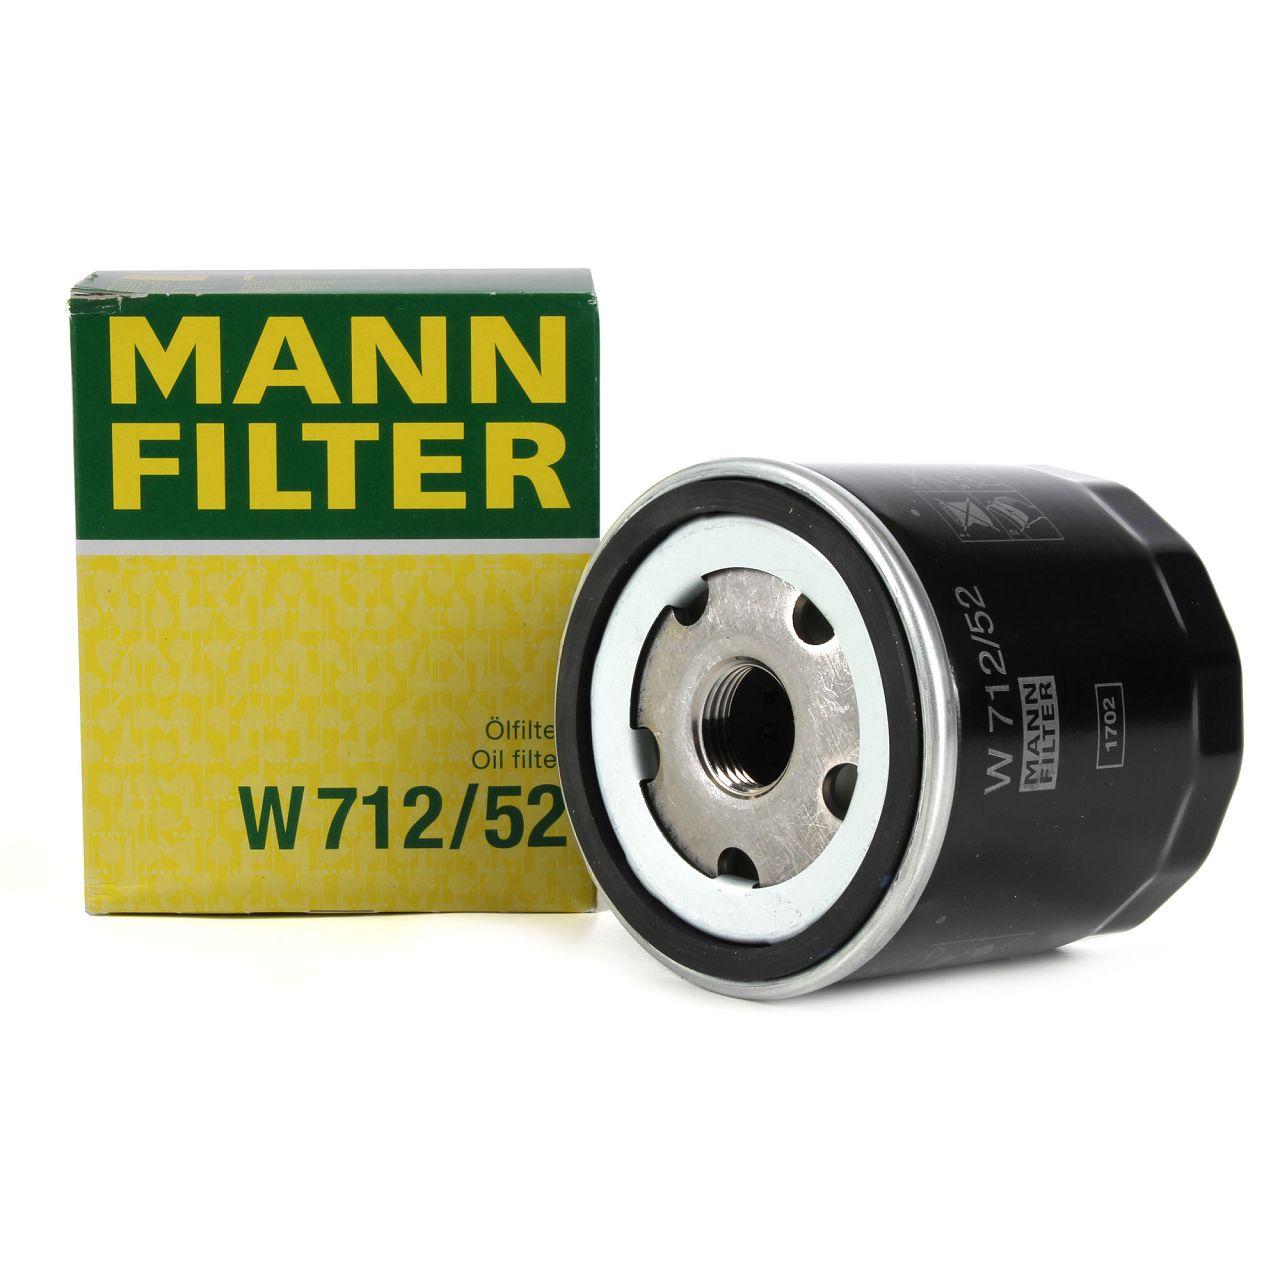 MANN W712/52 Ölfilter AUDI A2 SEAT SKODA VW Golf 3 4 5 6 Lupo Polo Vento 1.4 1.6